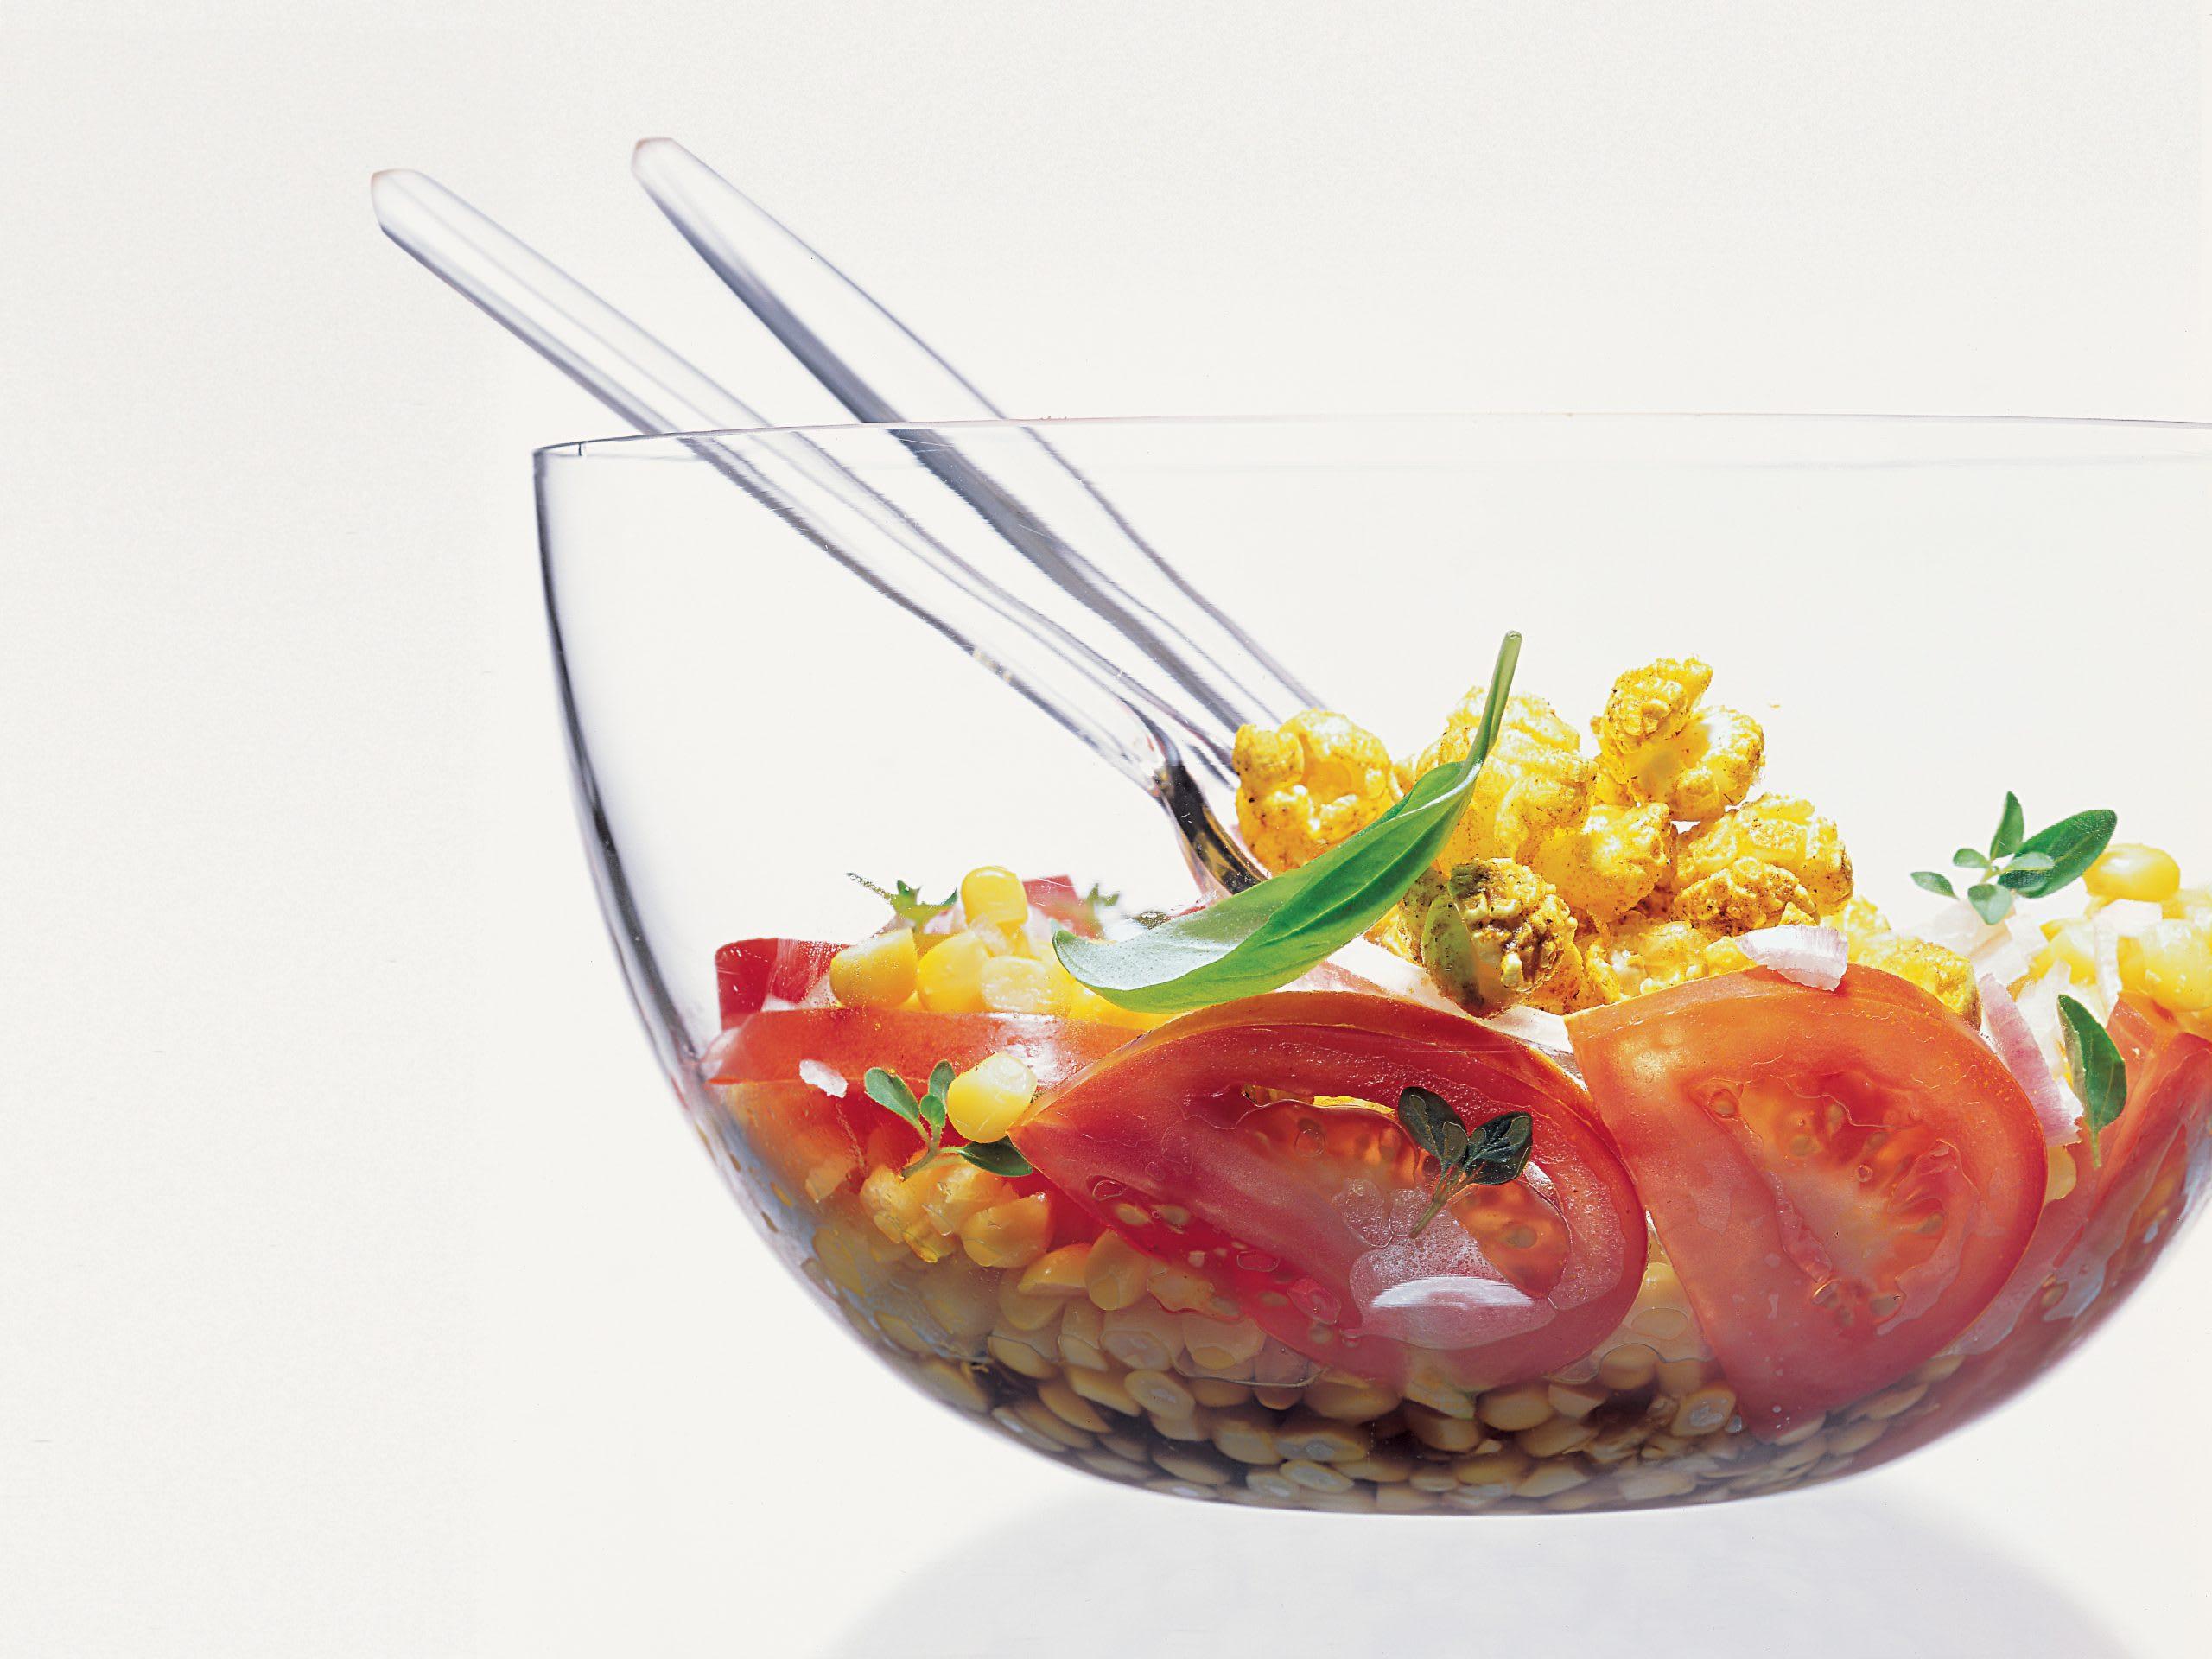 Salade de tomates au maïs et popcorn au curry